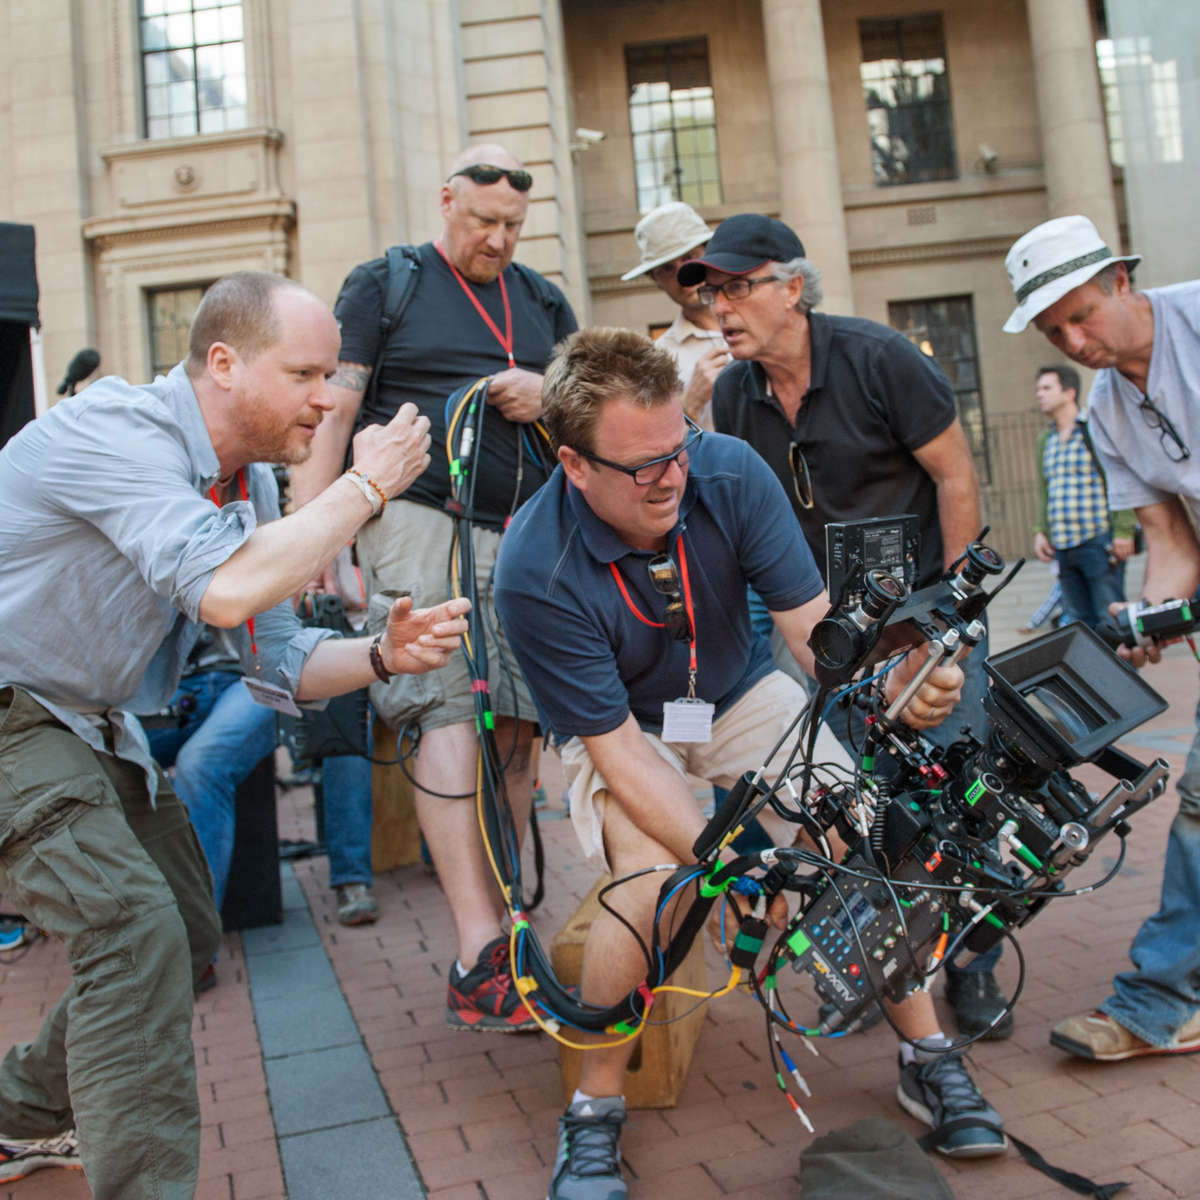 joss-whedon-avengers-age-of-ultron-set-image.jpg